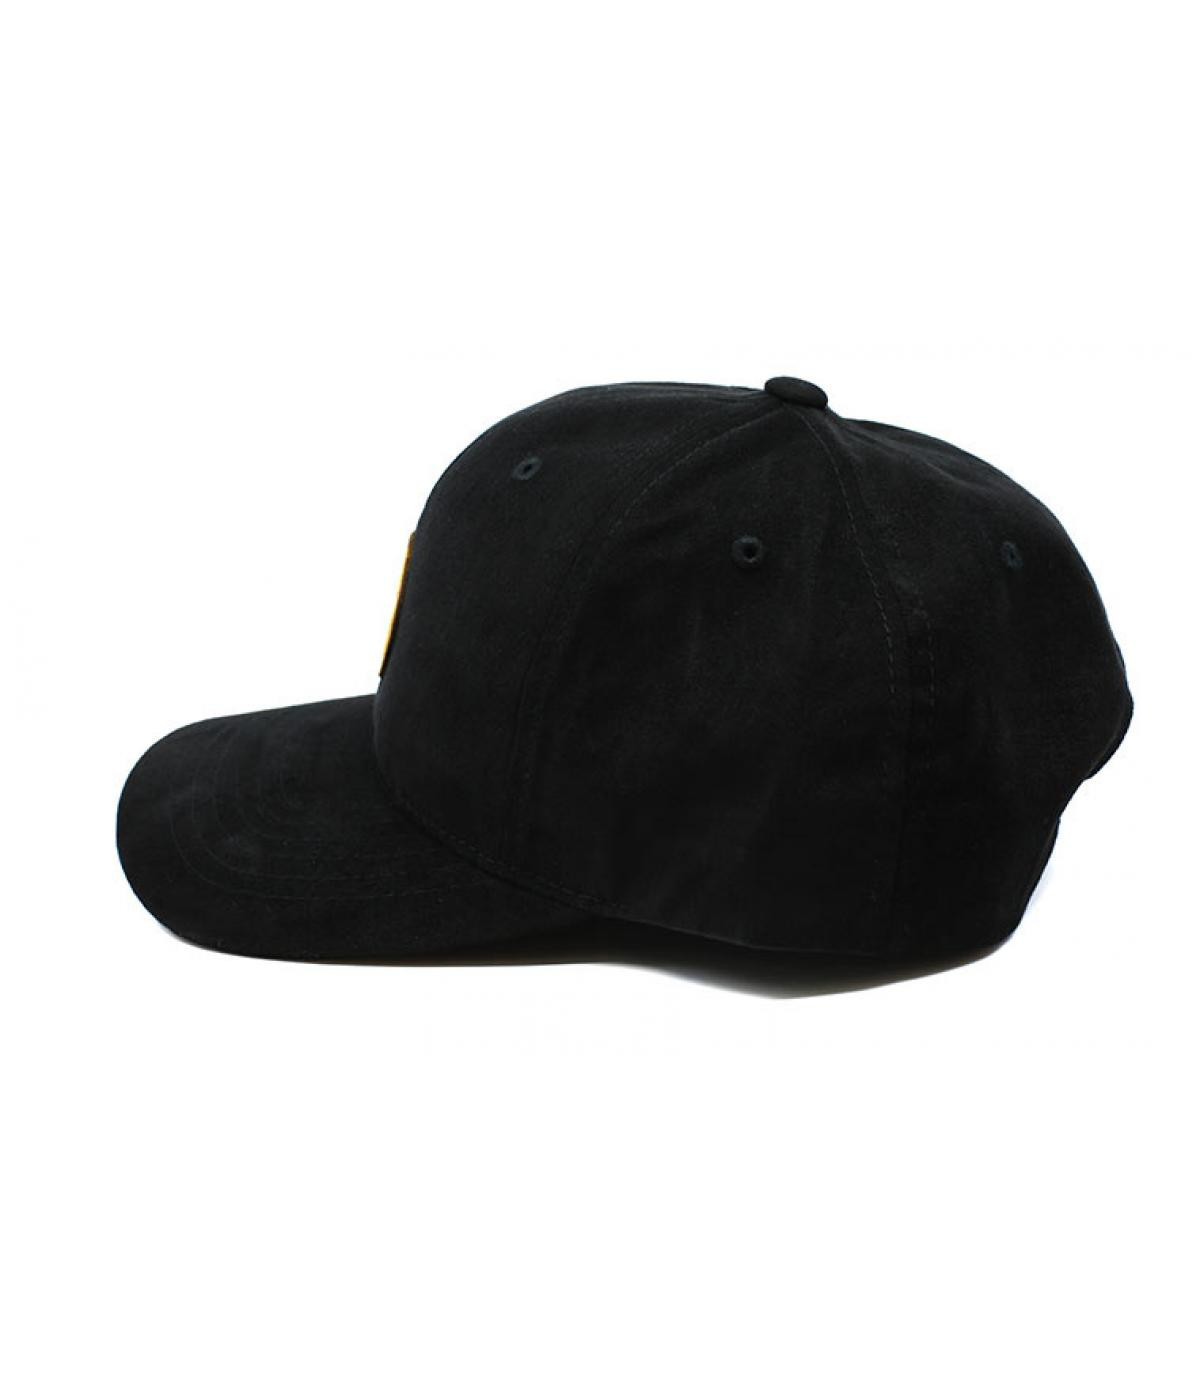 Détails Curved black - image 4